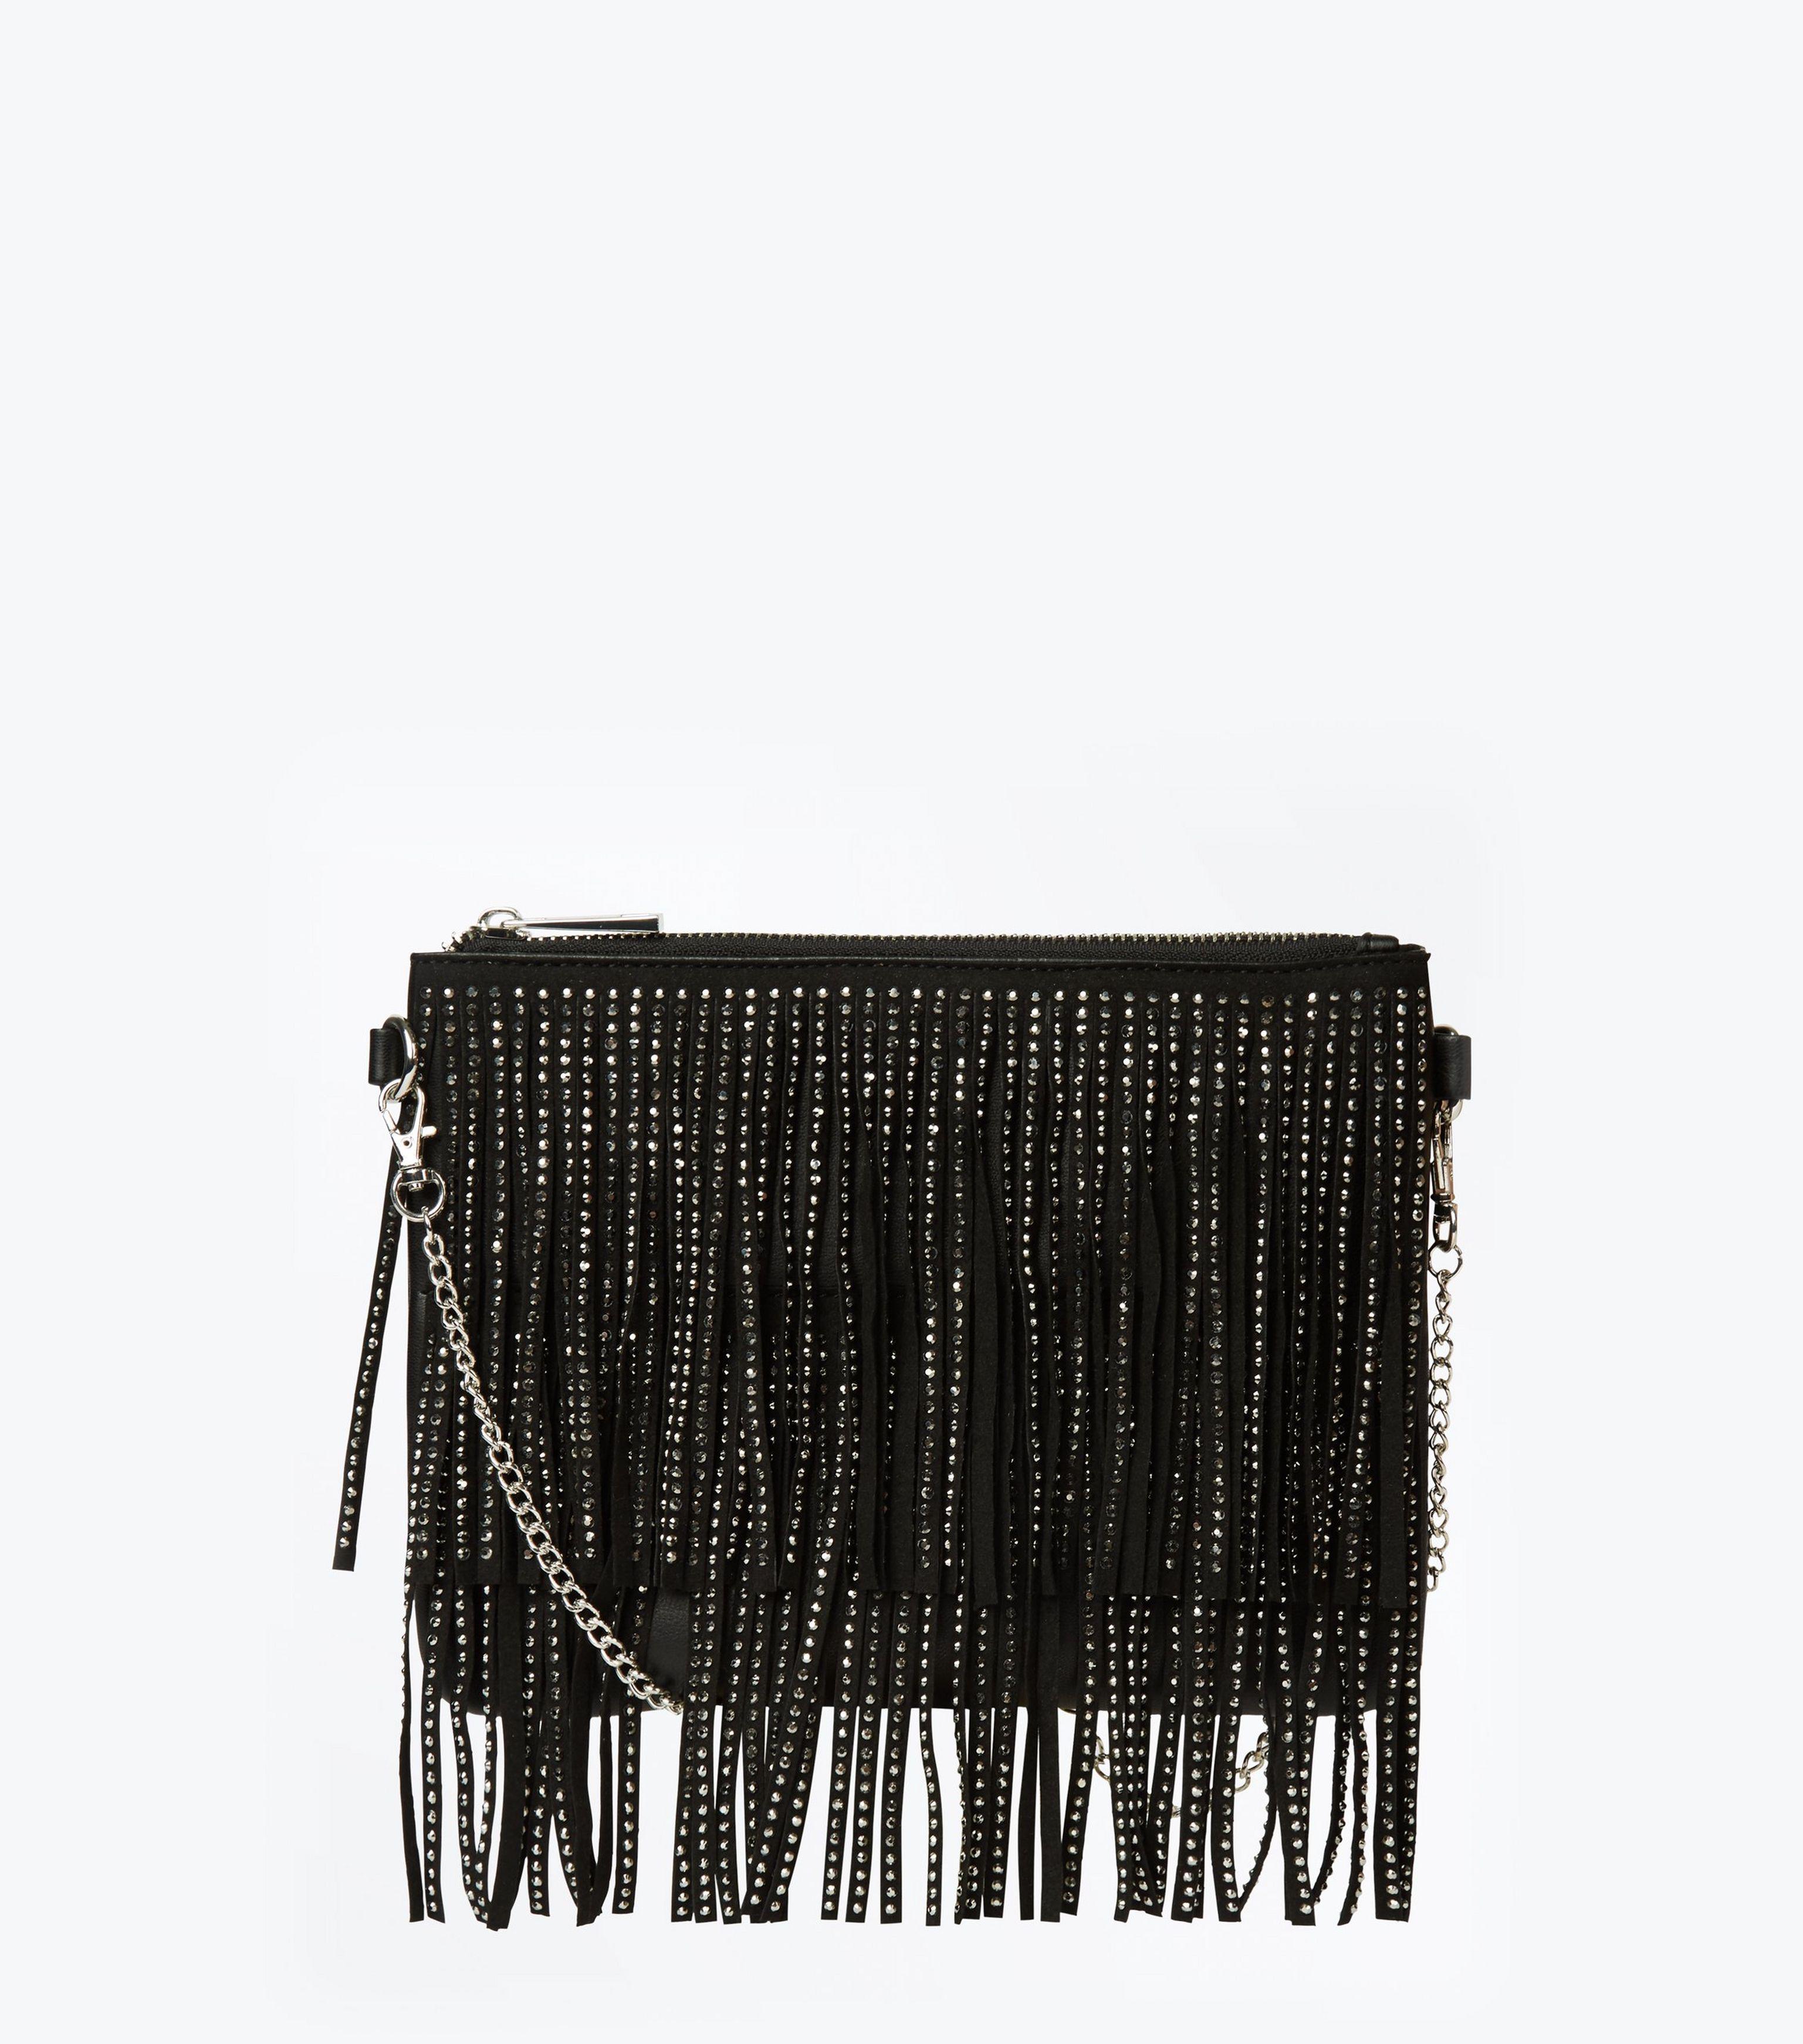 9ad67834c6 New Look Black Diamante Double Fringe Shoulder Bag in Black - Lyst